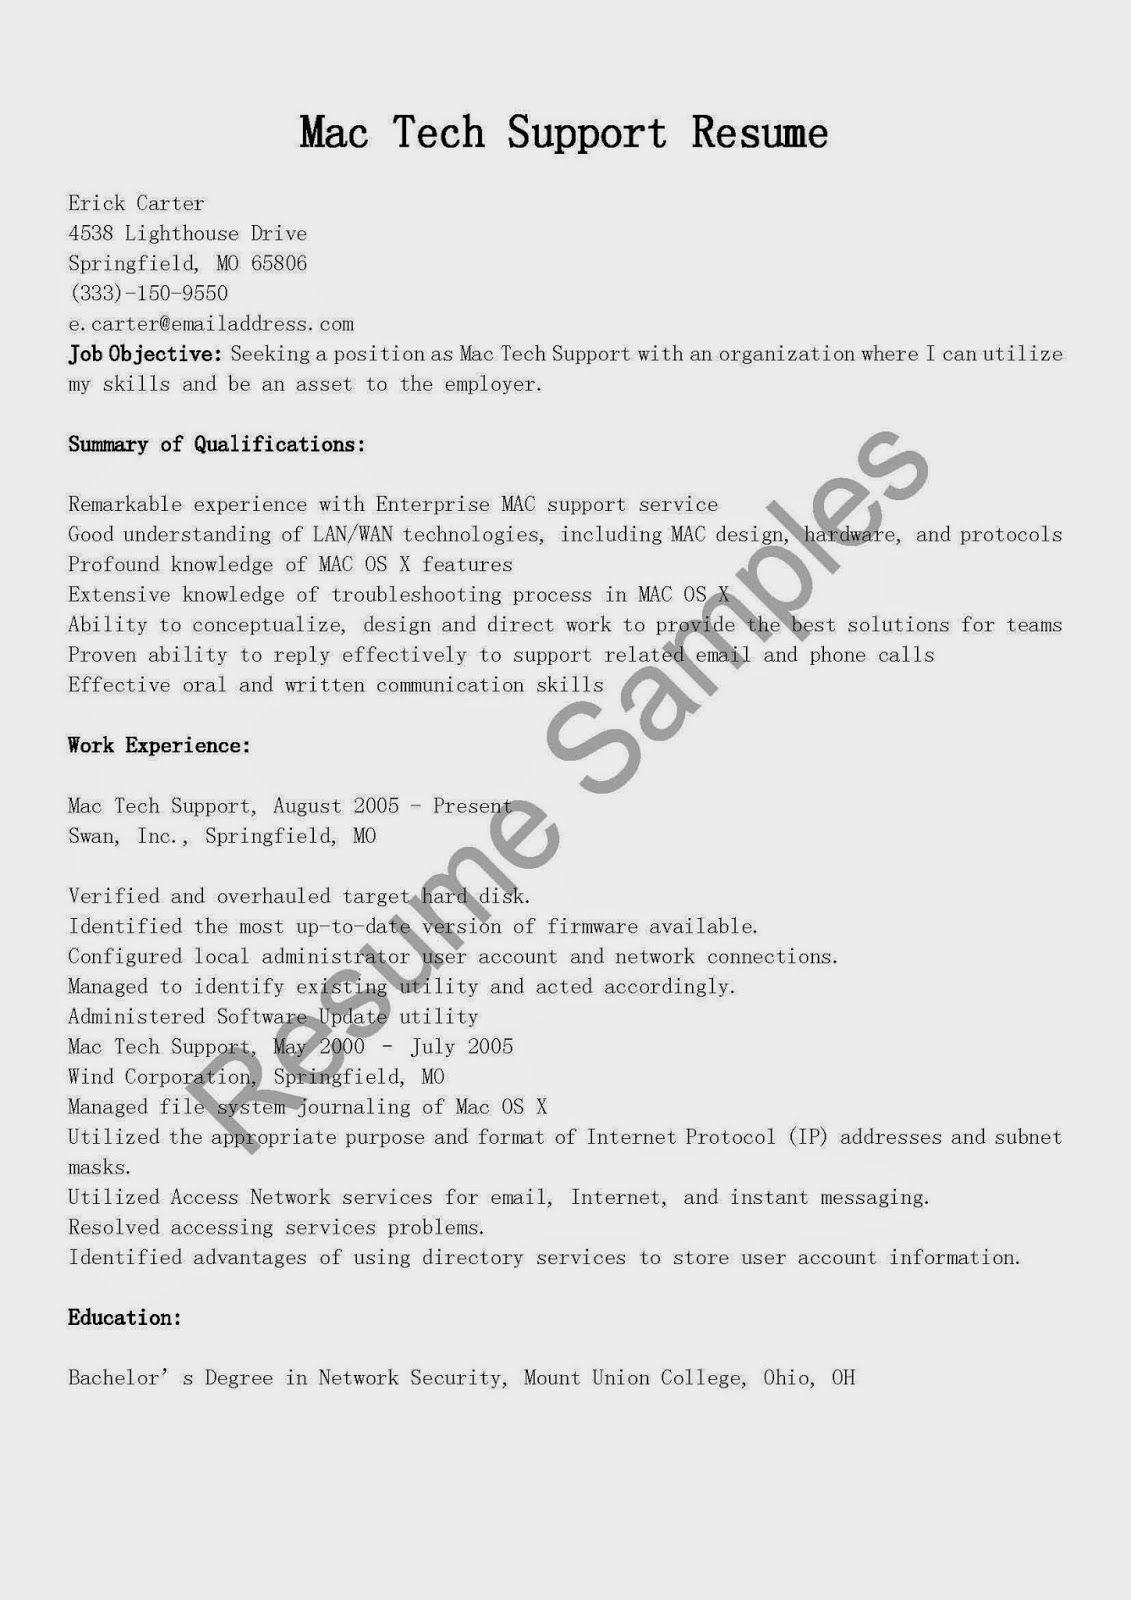 Mac Tech Support Resume Sample Job Resume Samples Resume Sample Resume